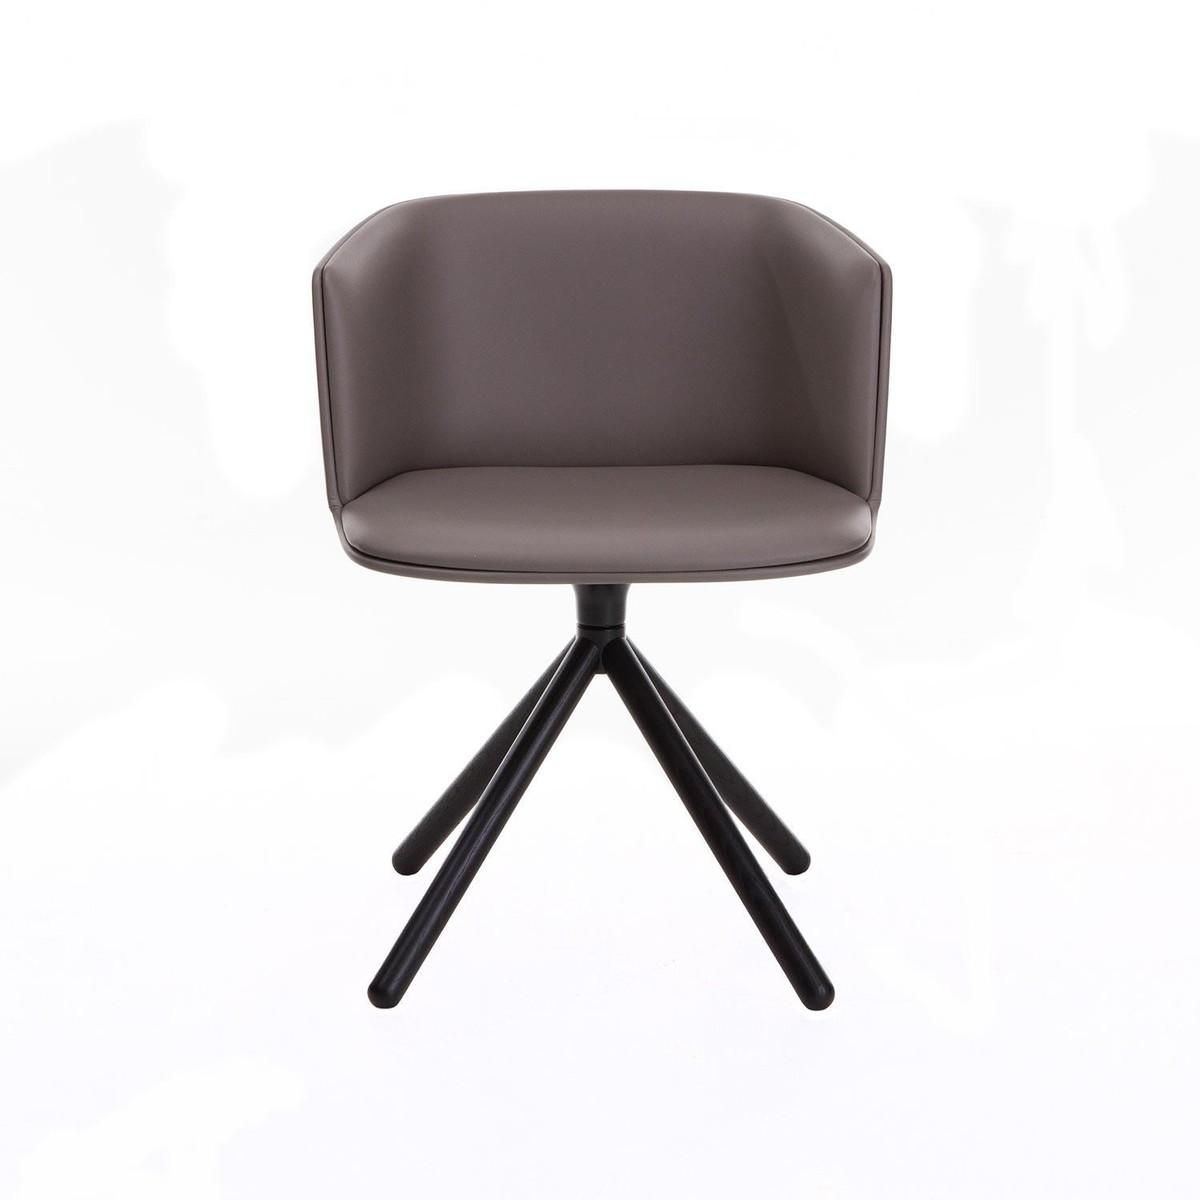 cut armlehnstuhl leder holzgestell schwarz la palma. Black Bedroom Furniture Sets. Home Design Ideas